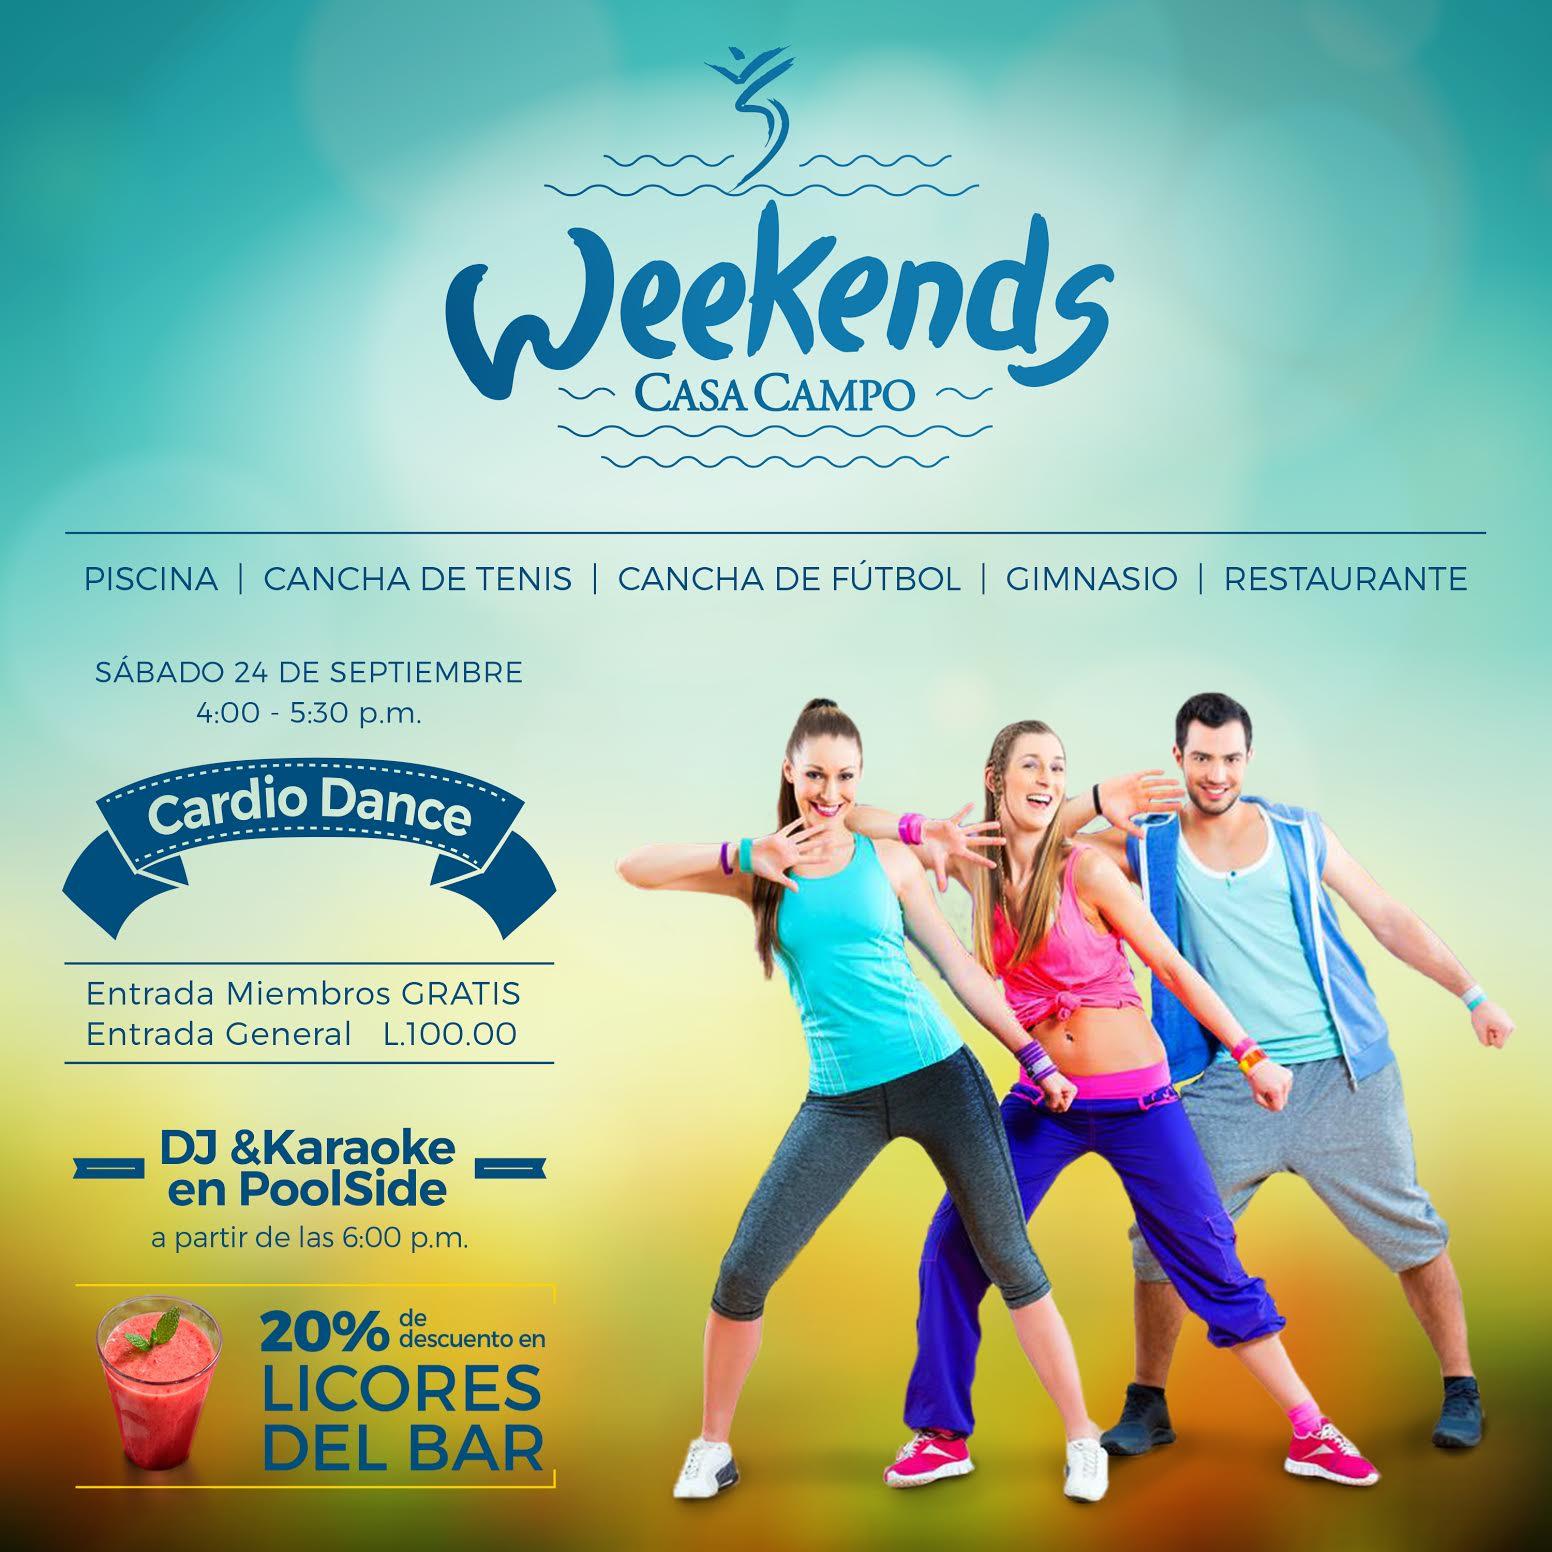 Cardio Dance Casa Campo